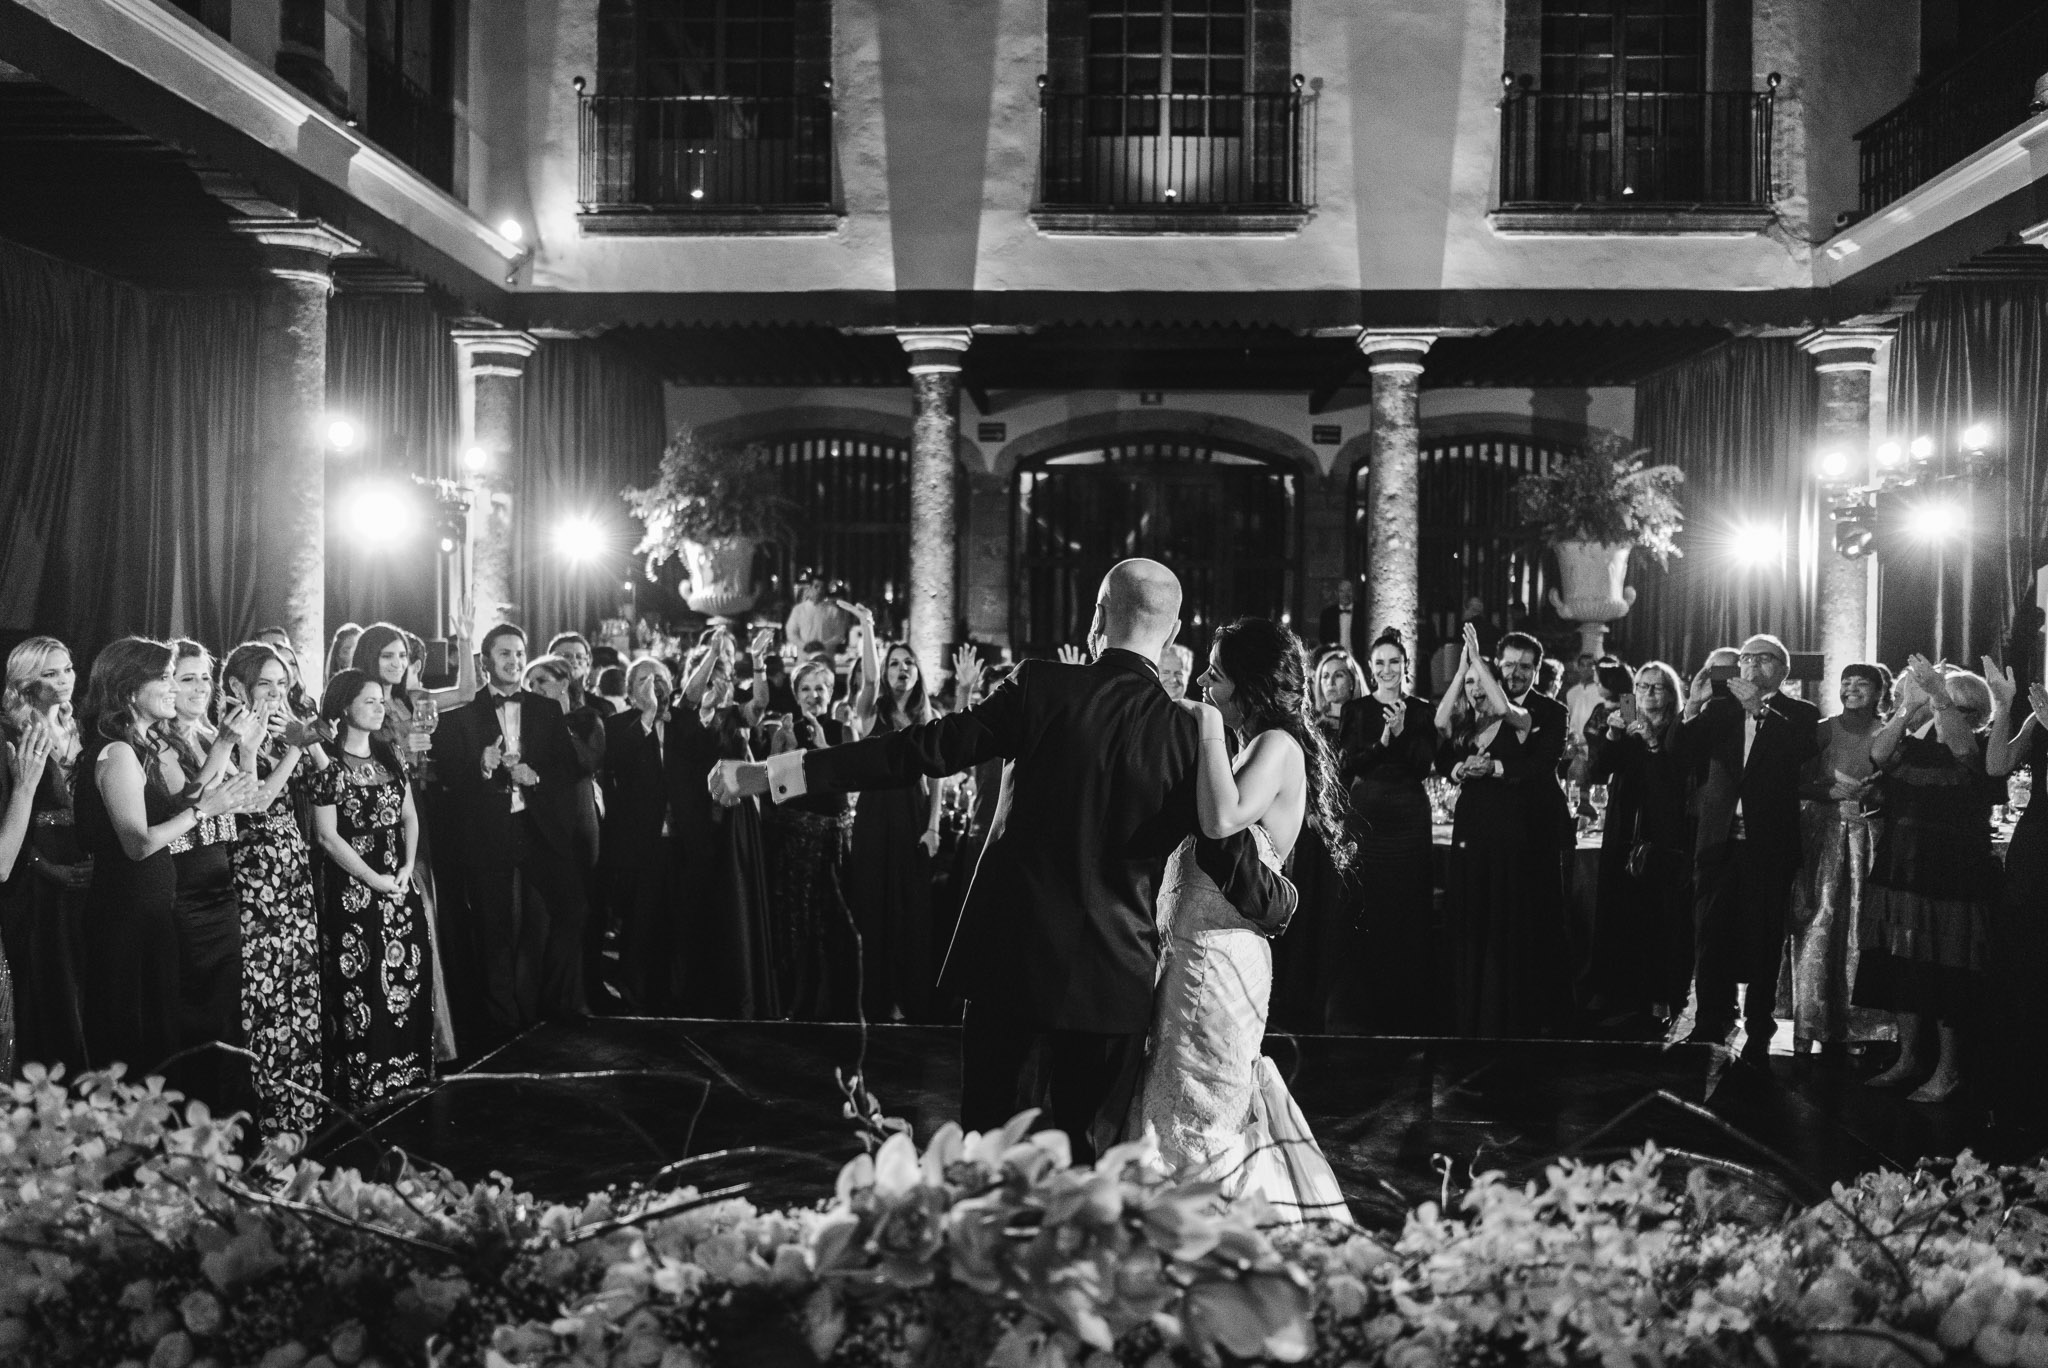 ©www.mauriziosolisbroca.com-20161002maurizio-solis-broca-mexico-canada-wedding-photographer20161002DSC05458-Edit.jpg